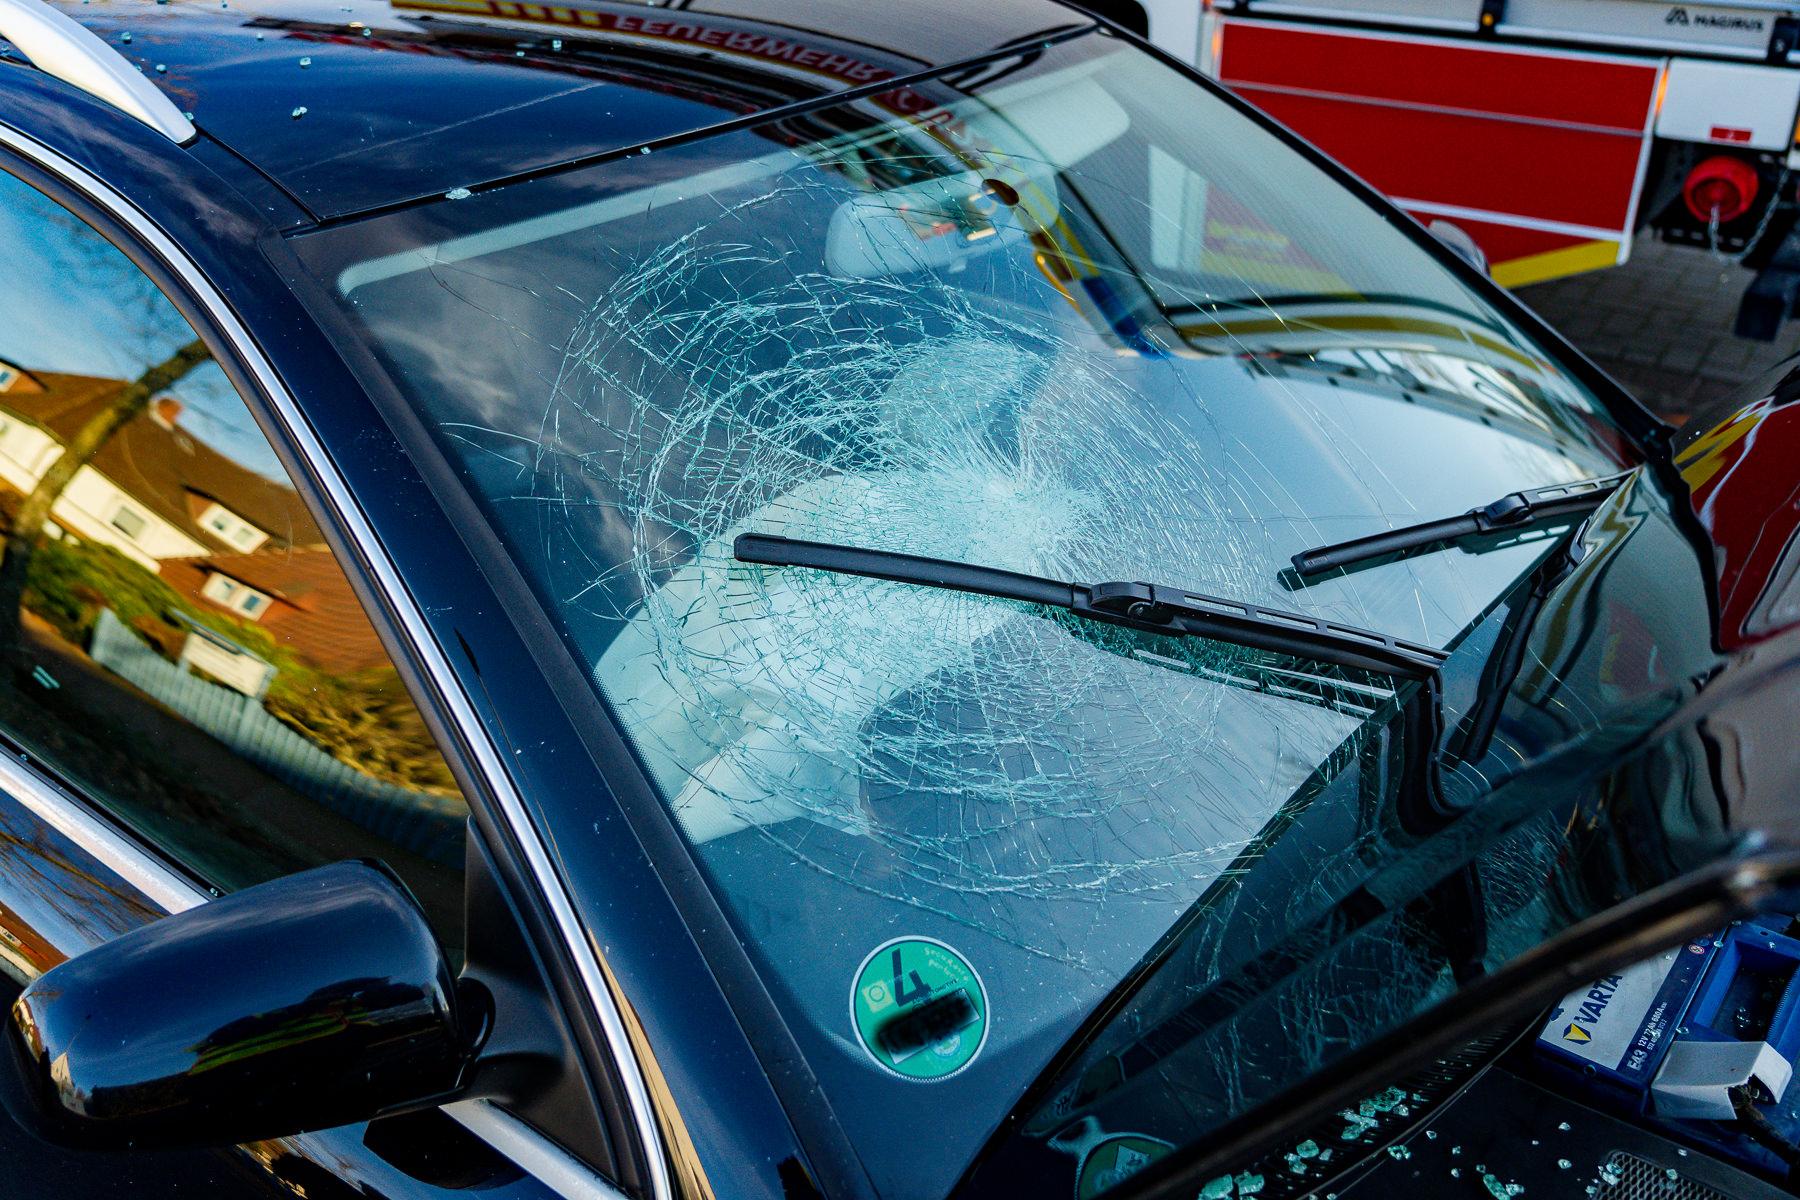 Zersplittert: Airbags haben hier stärkere Verletzungen verhindert. (Foto: n112.de/Stefan Simonsen)